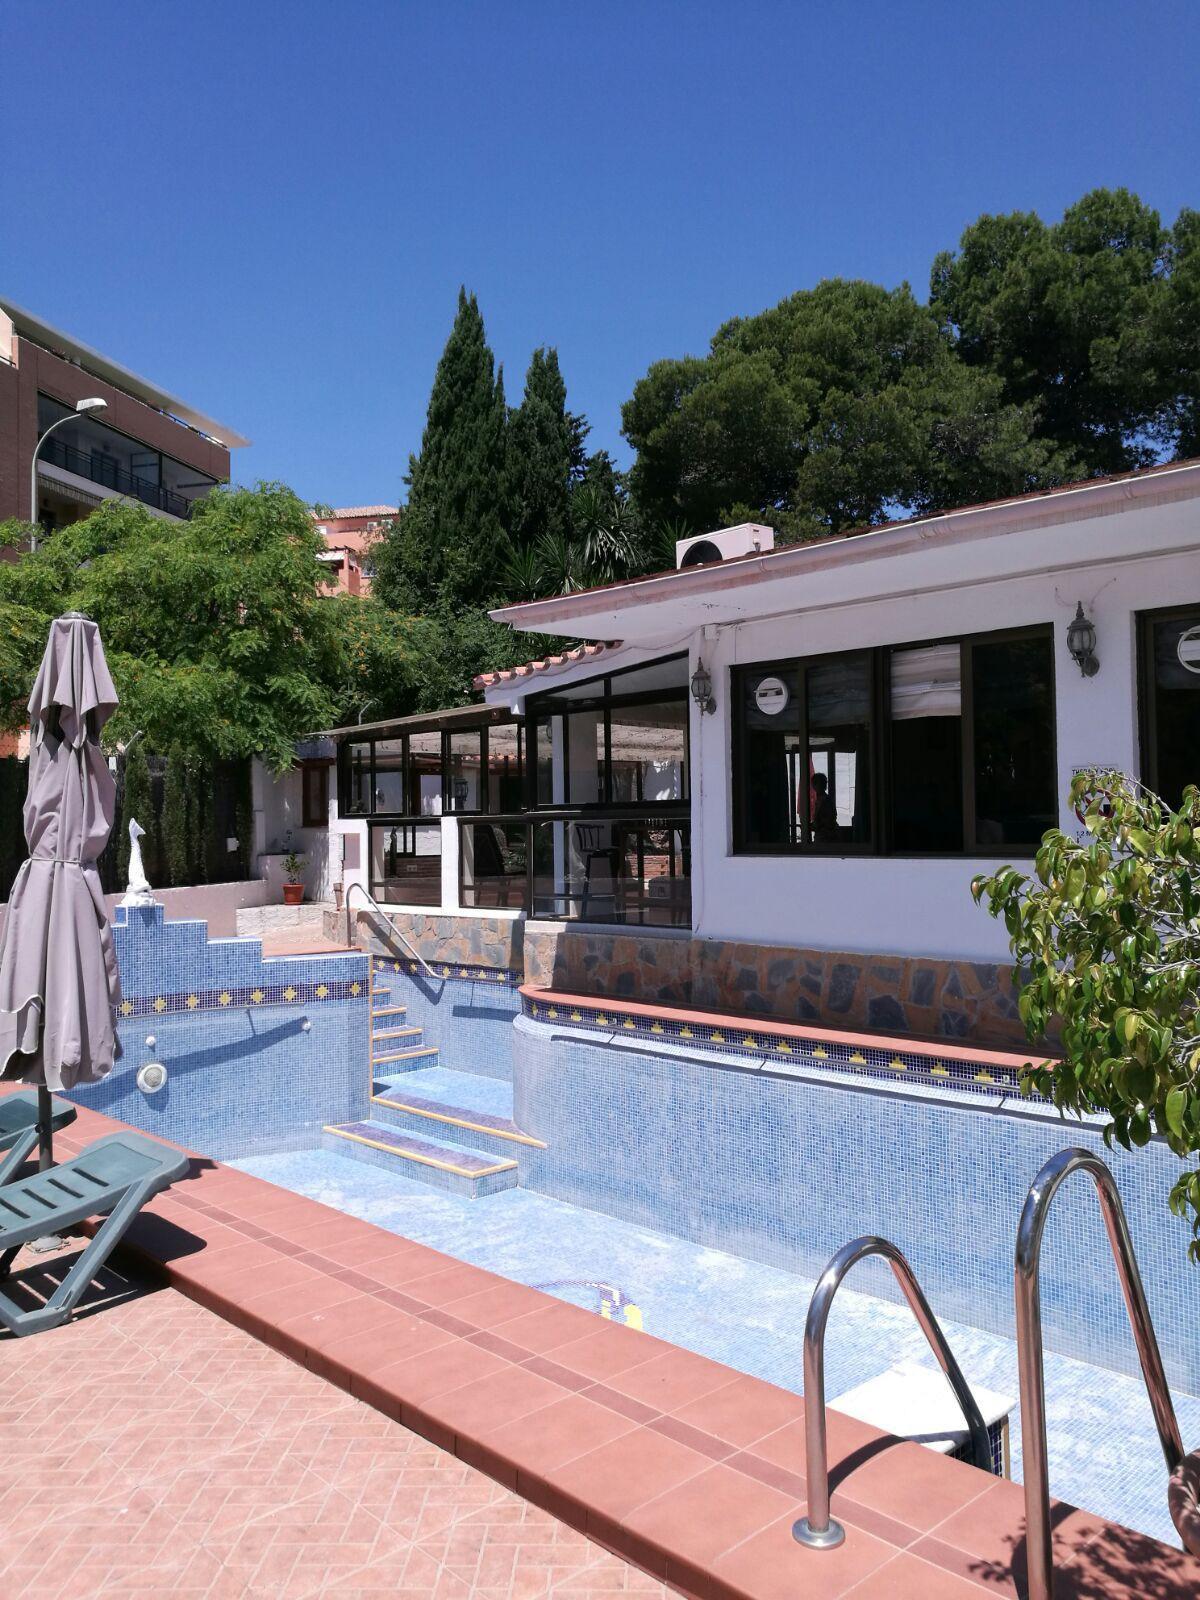 Detached, single story villa of individual character located in the El Pinillo area of Torremolinos.,Spain